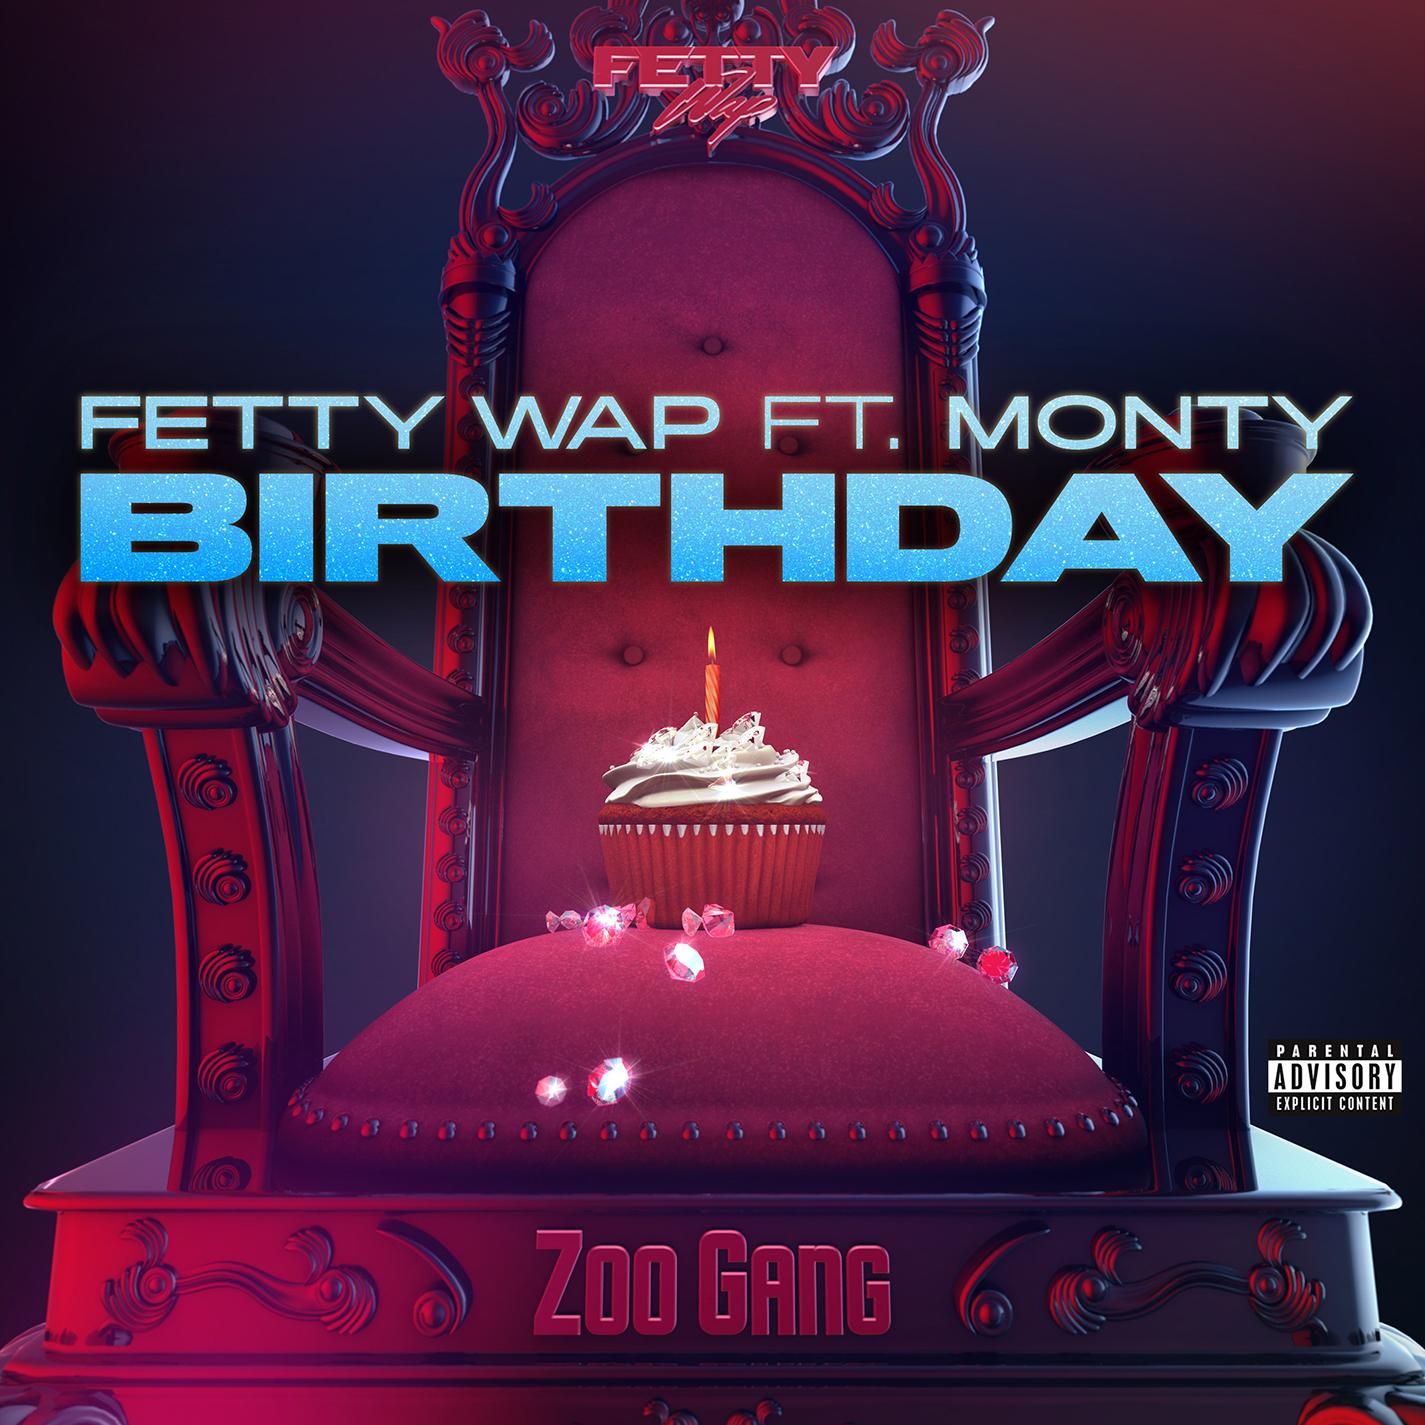 Listen Free to Fetty Wap - Birthday (feat. Monty) Radio | iHeartRadio